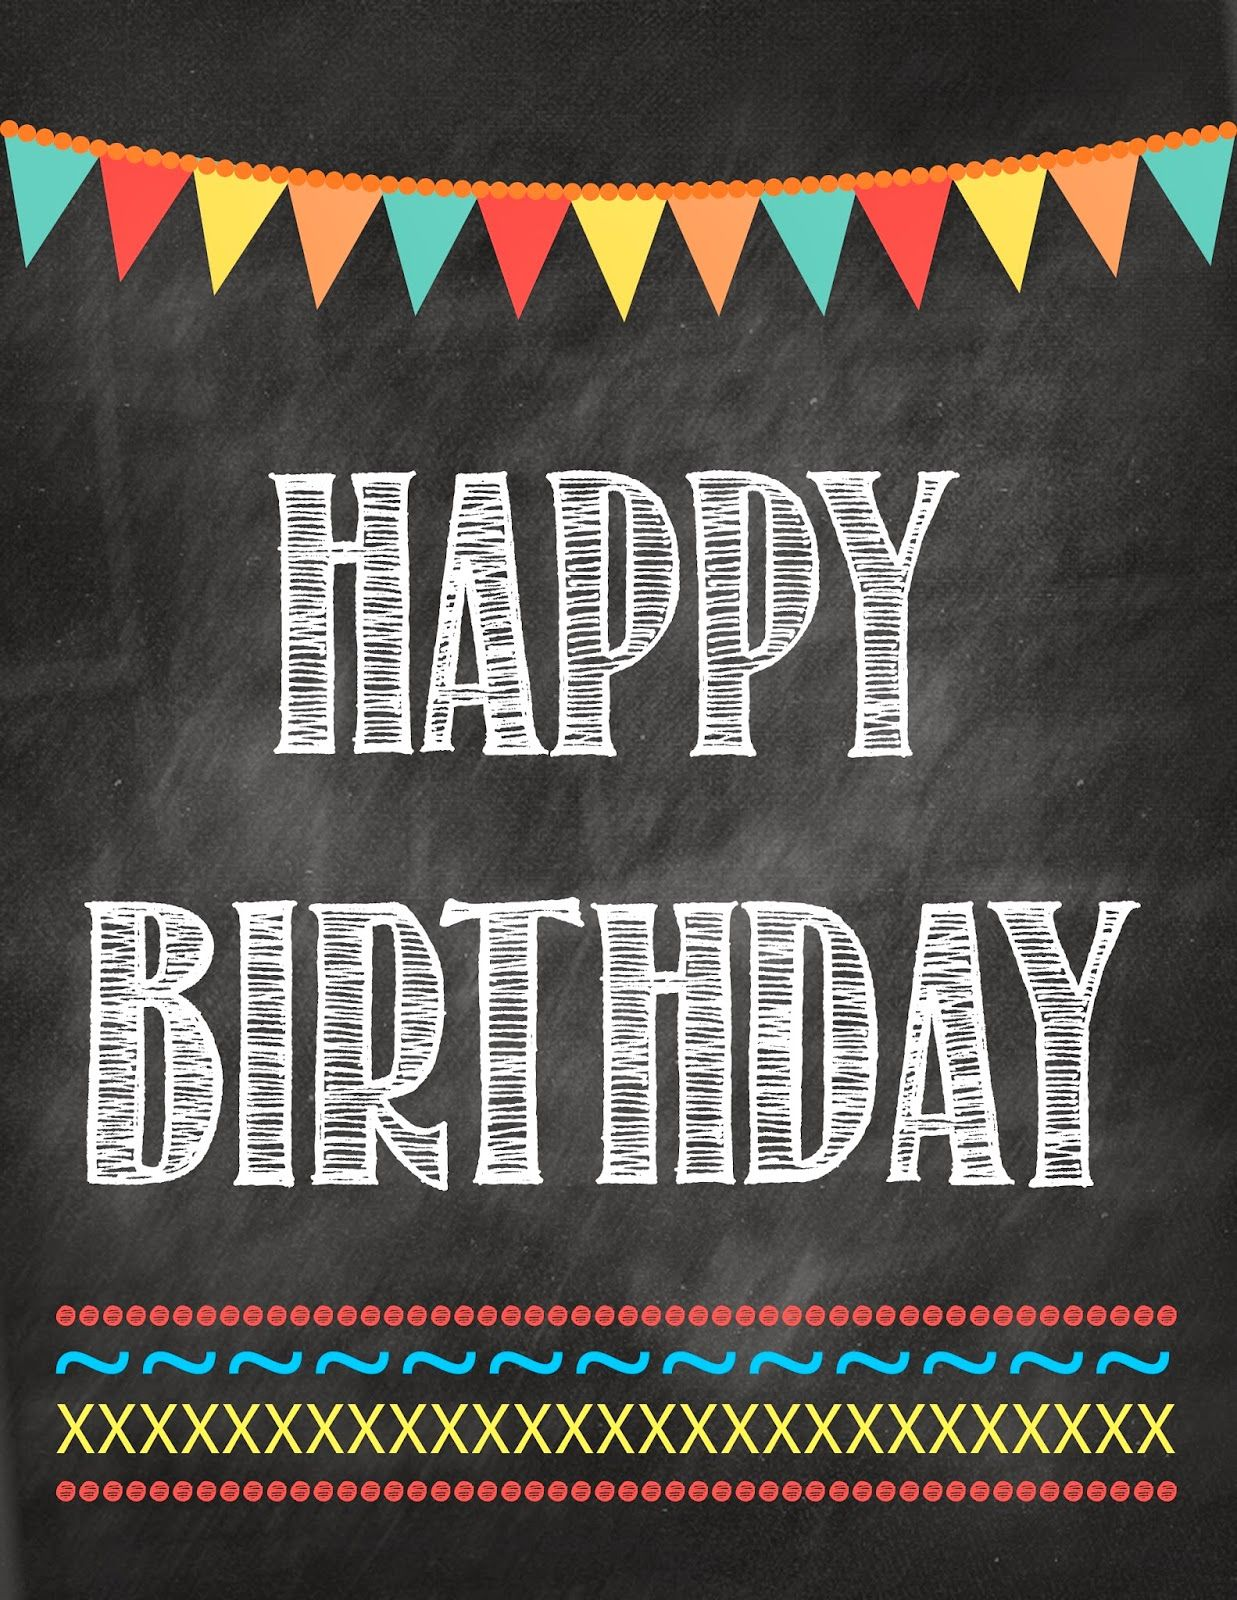 Second Chance To Dream Free Birthday Printable & Birth Verse